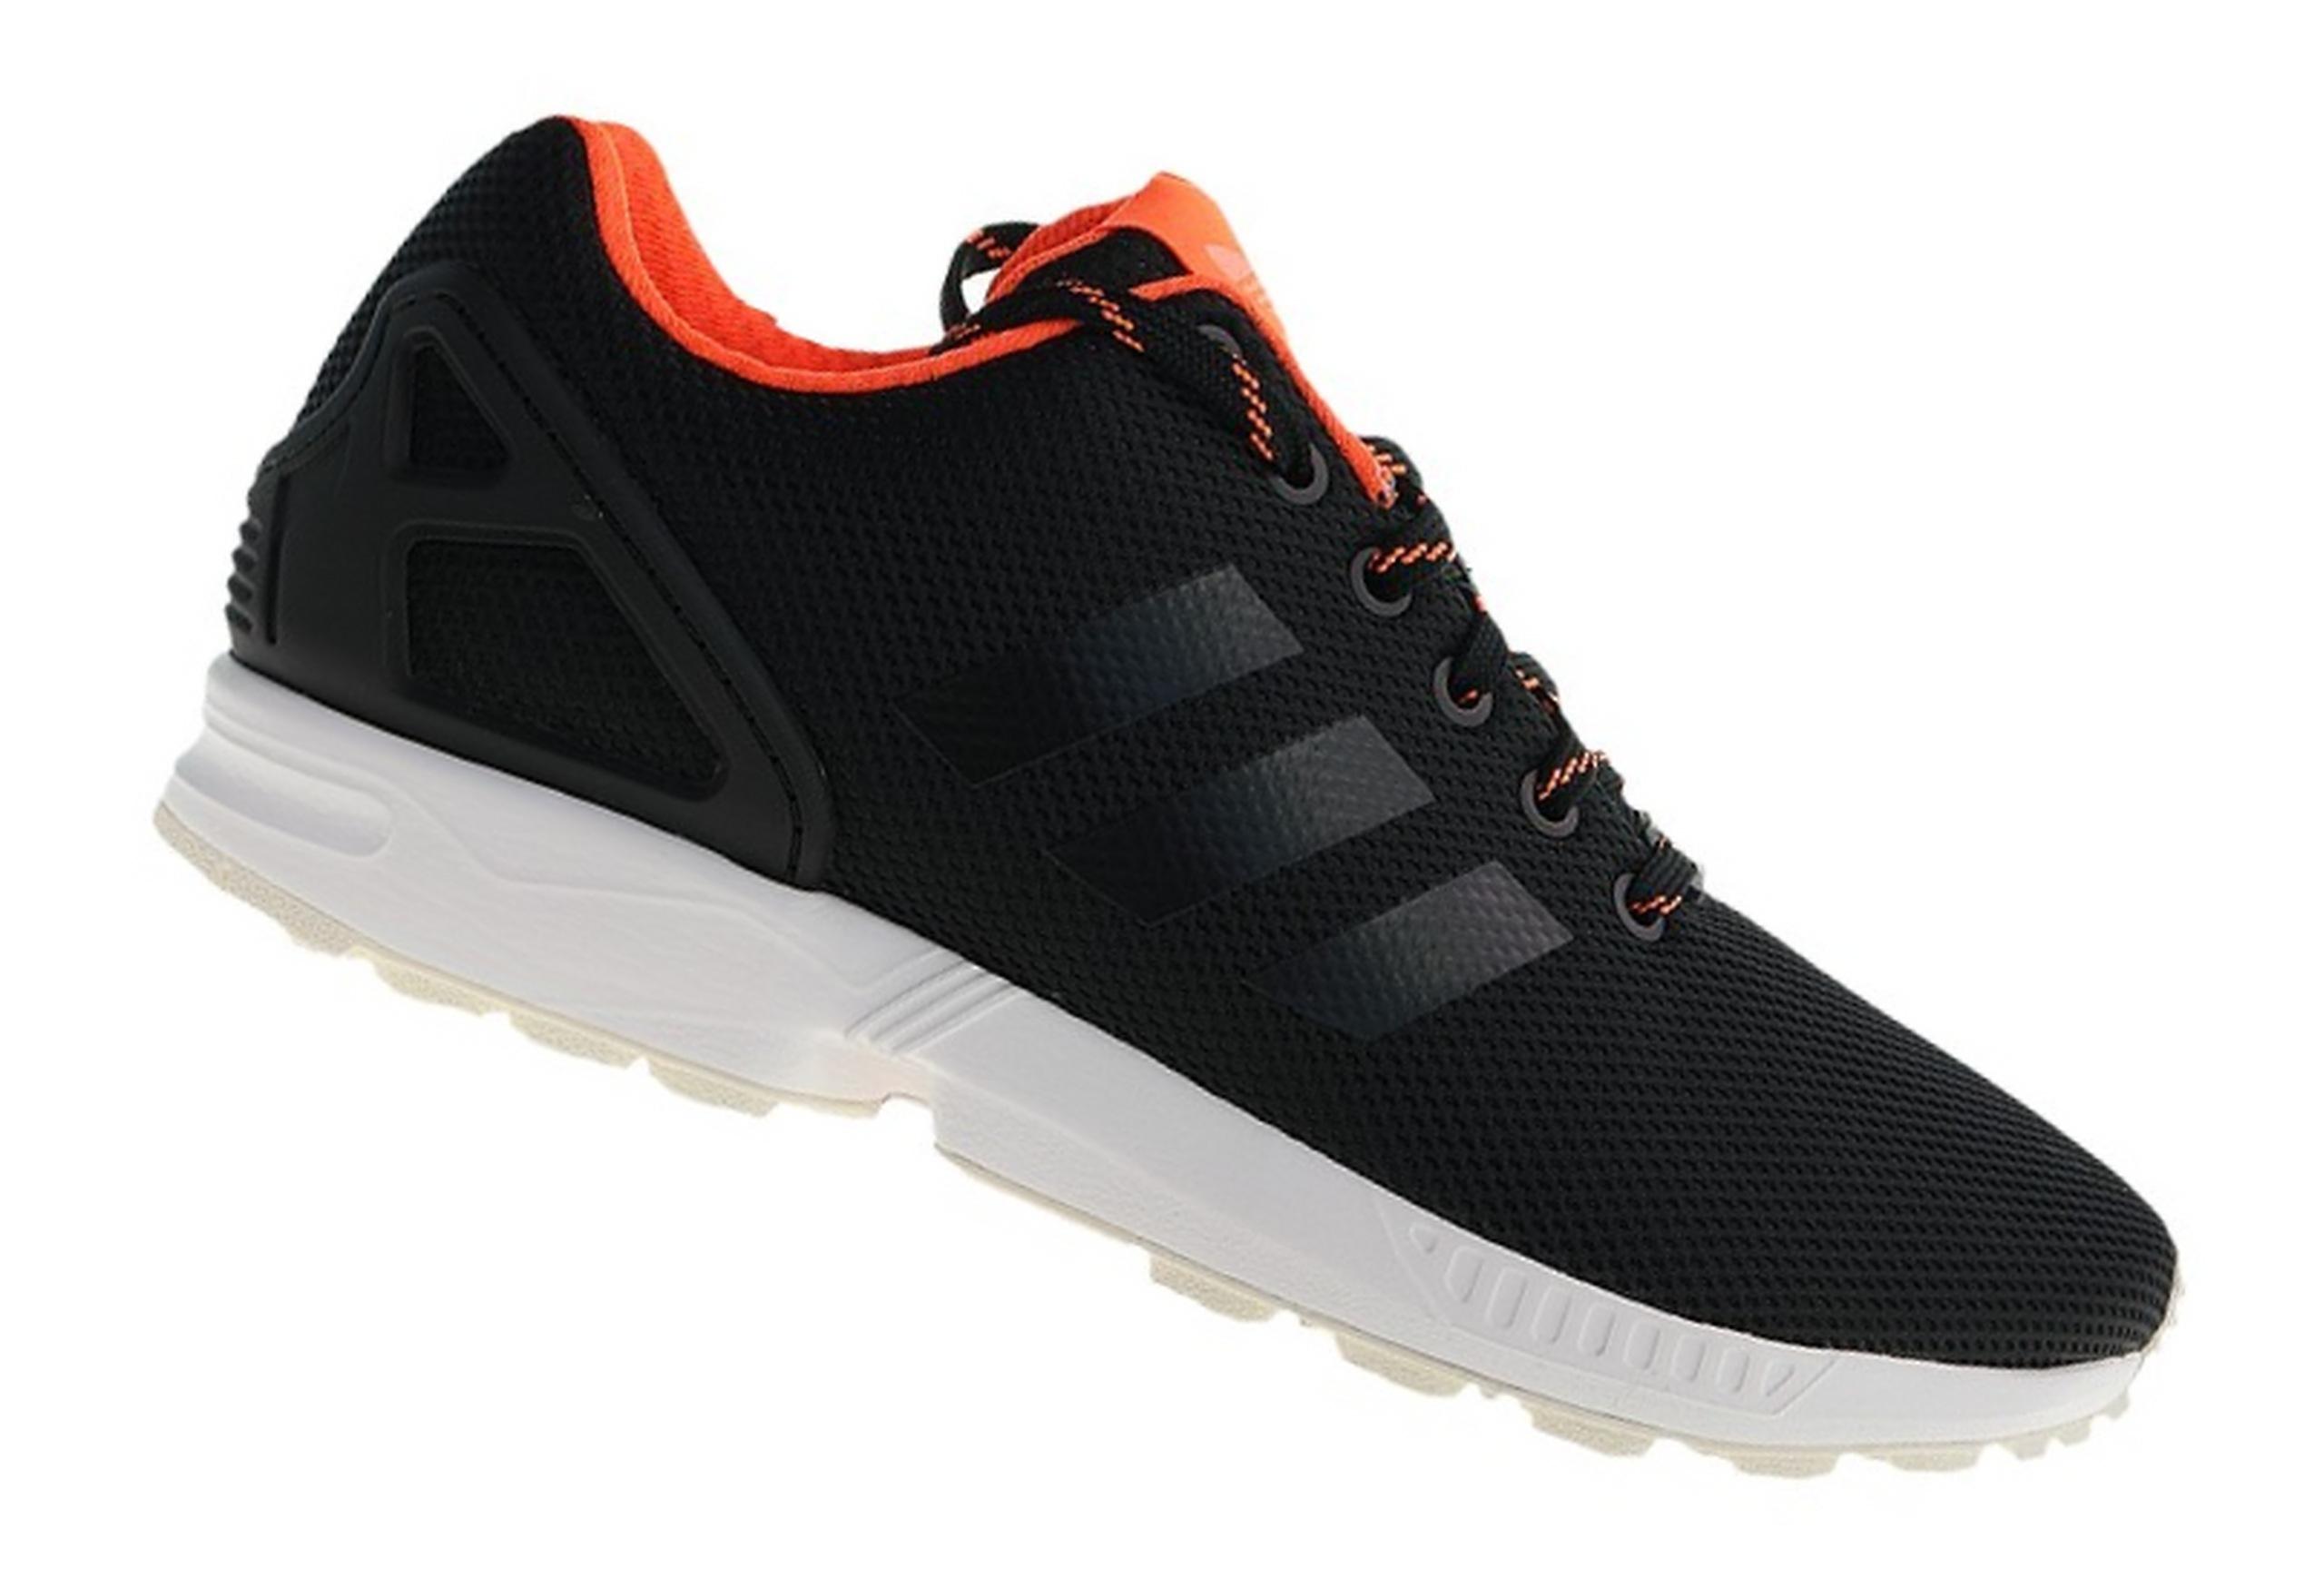 NIKE airmax air max buty m?skie adidas zx flux 41,42,43,44